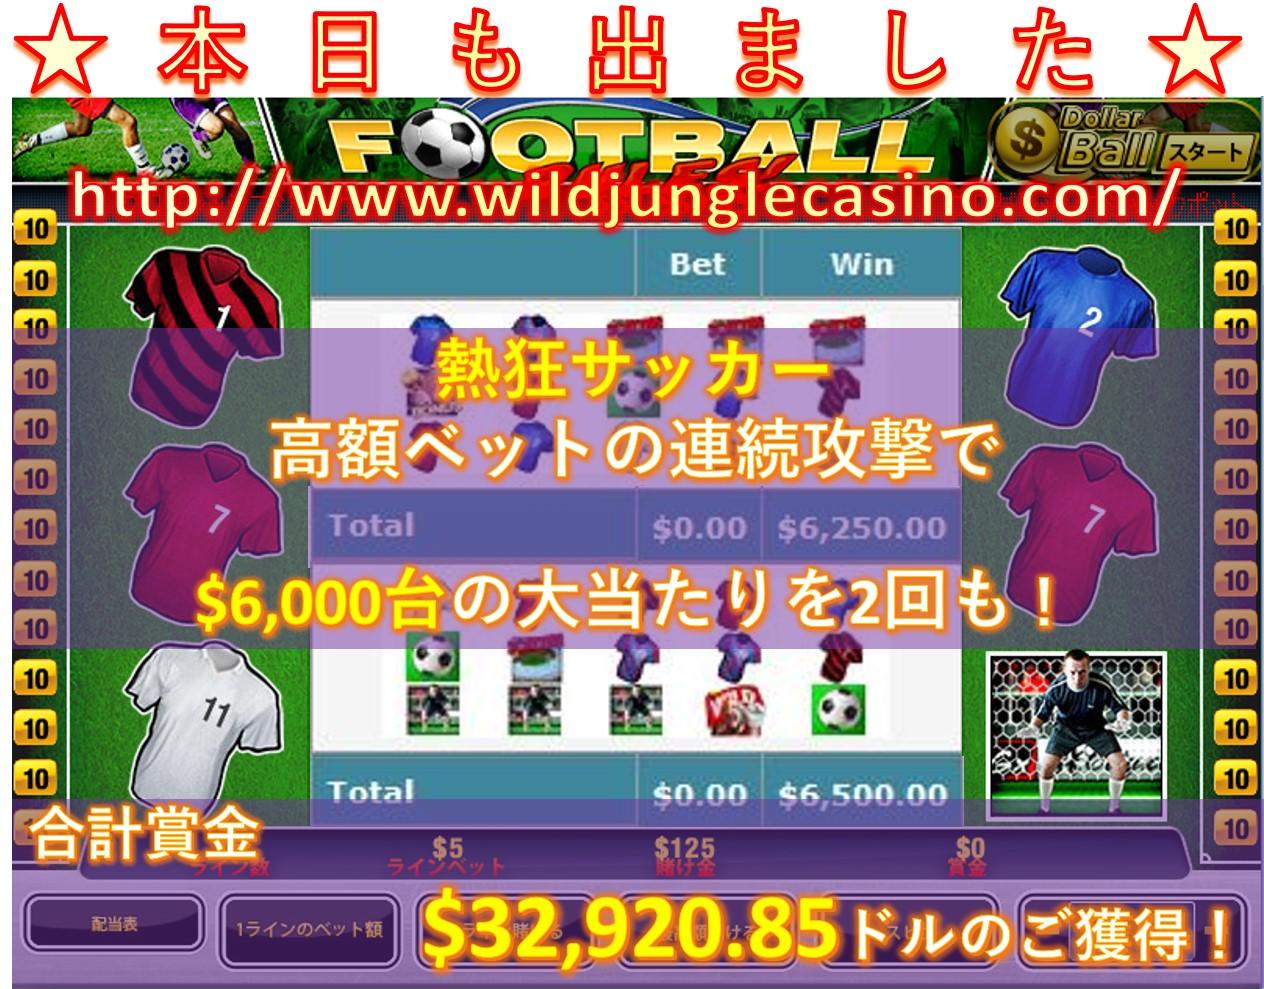 410_WJR91578222-mizuho kakuta_Football Rules_$32,920_JP